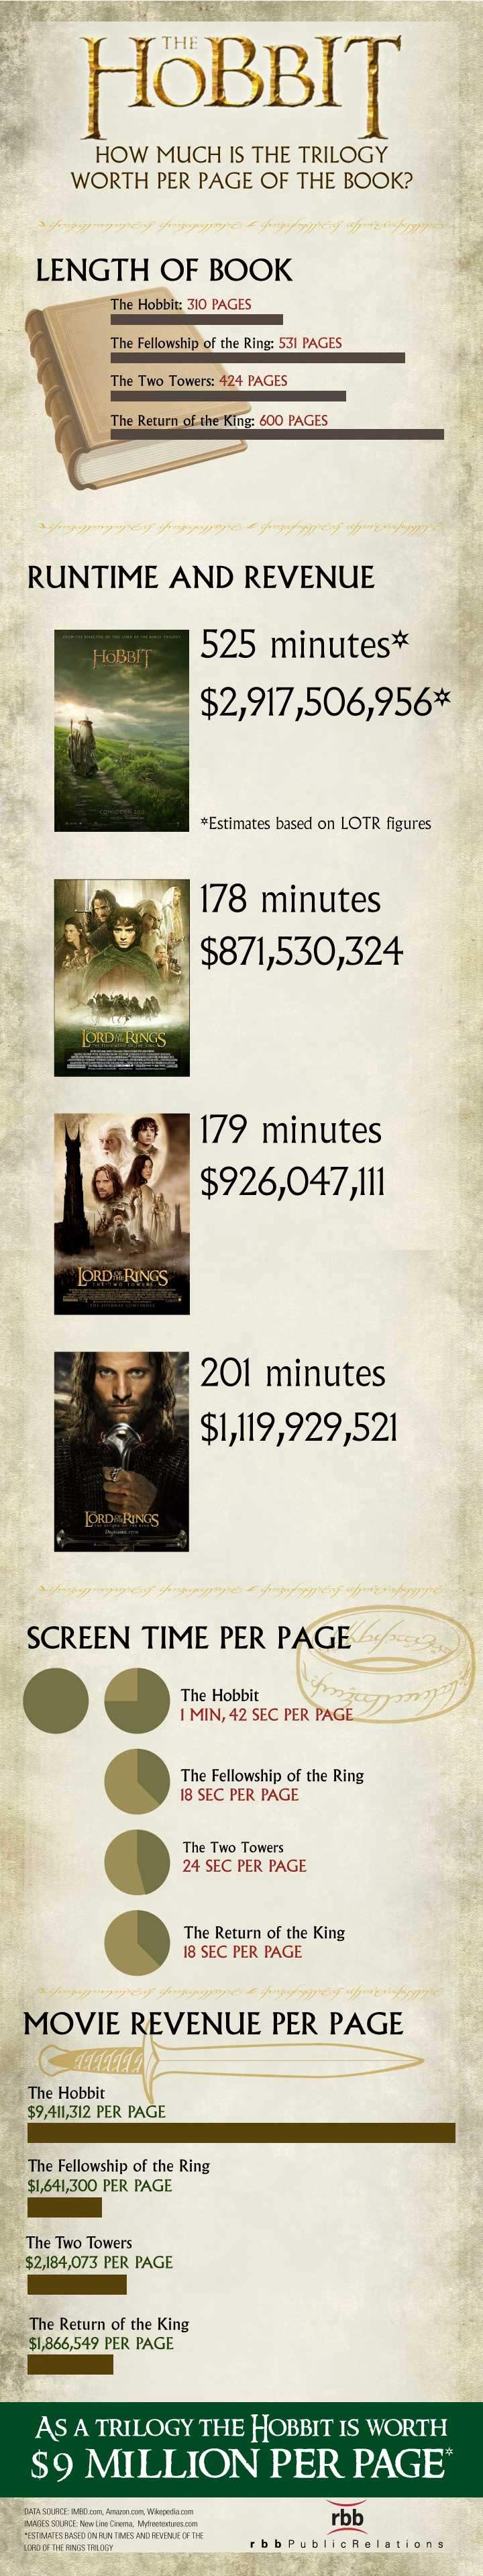 hobbit info graphic